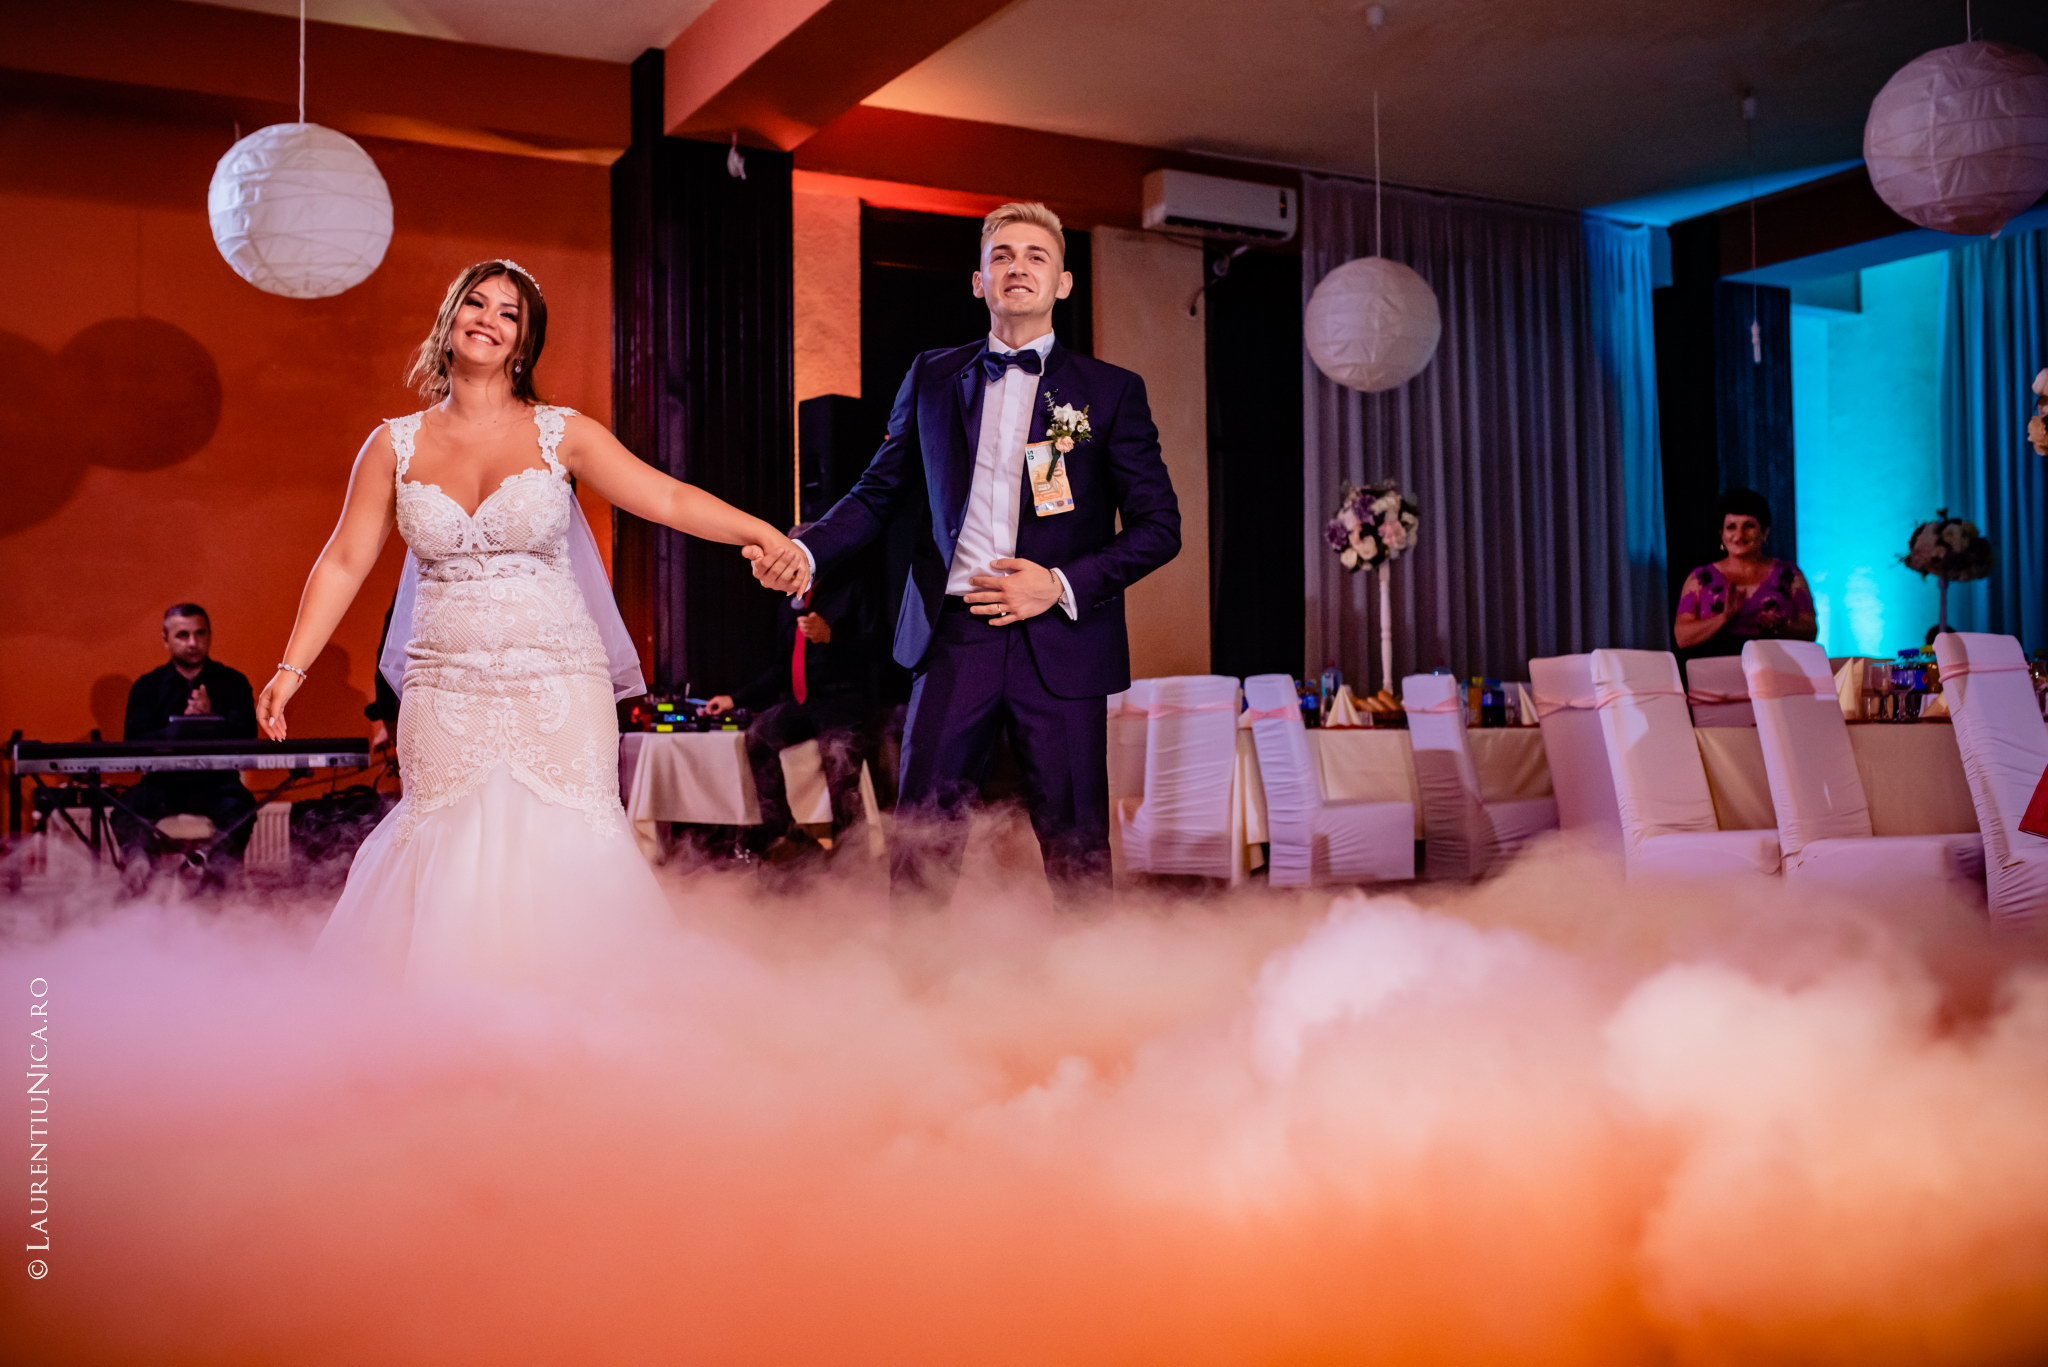 fotografii nunta Roxana si Cosmin fotograf nunta laurentiu nica 38 - Roxana & Cosmin | Fotografii nunta | Ticleni, judetul Gorj